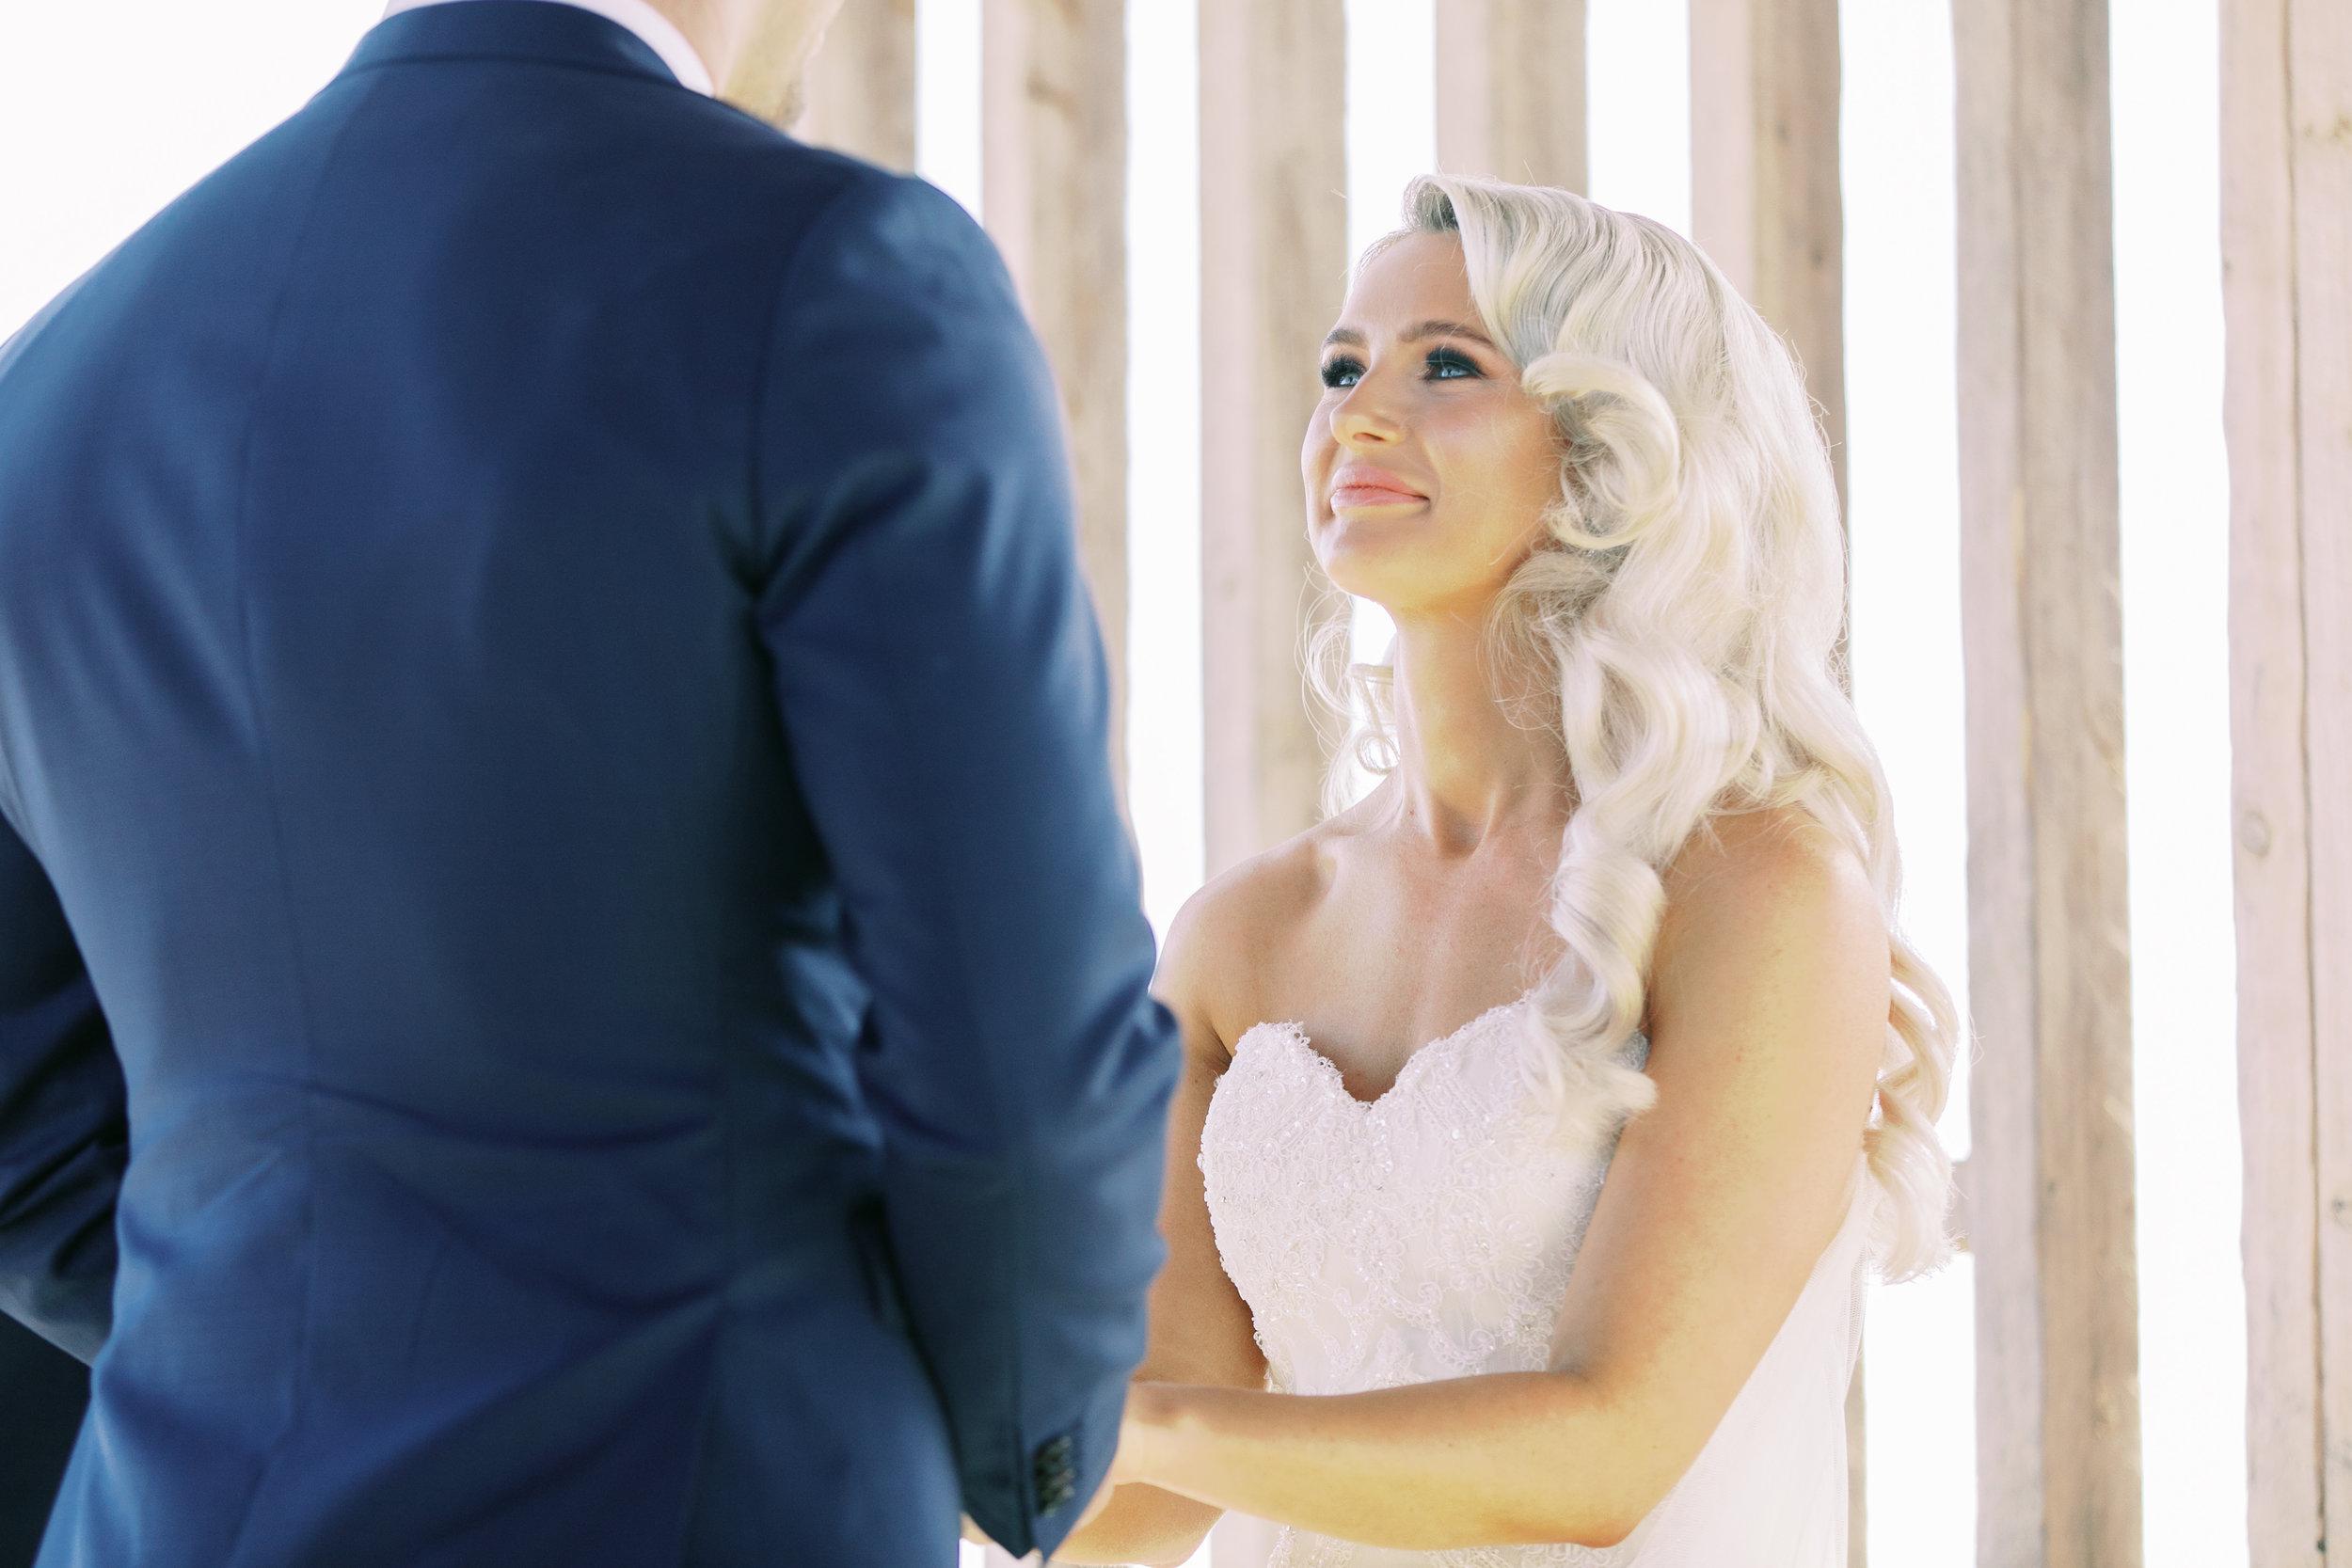 Kooroomba-Vineyard-Lavender-Farm-Wedding-Fine-Art-Lauren-Olivia-41.jpg